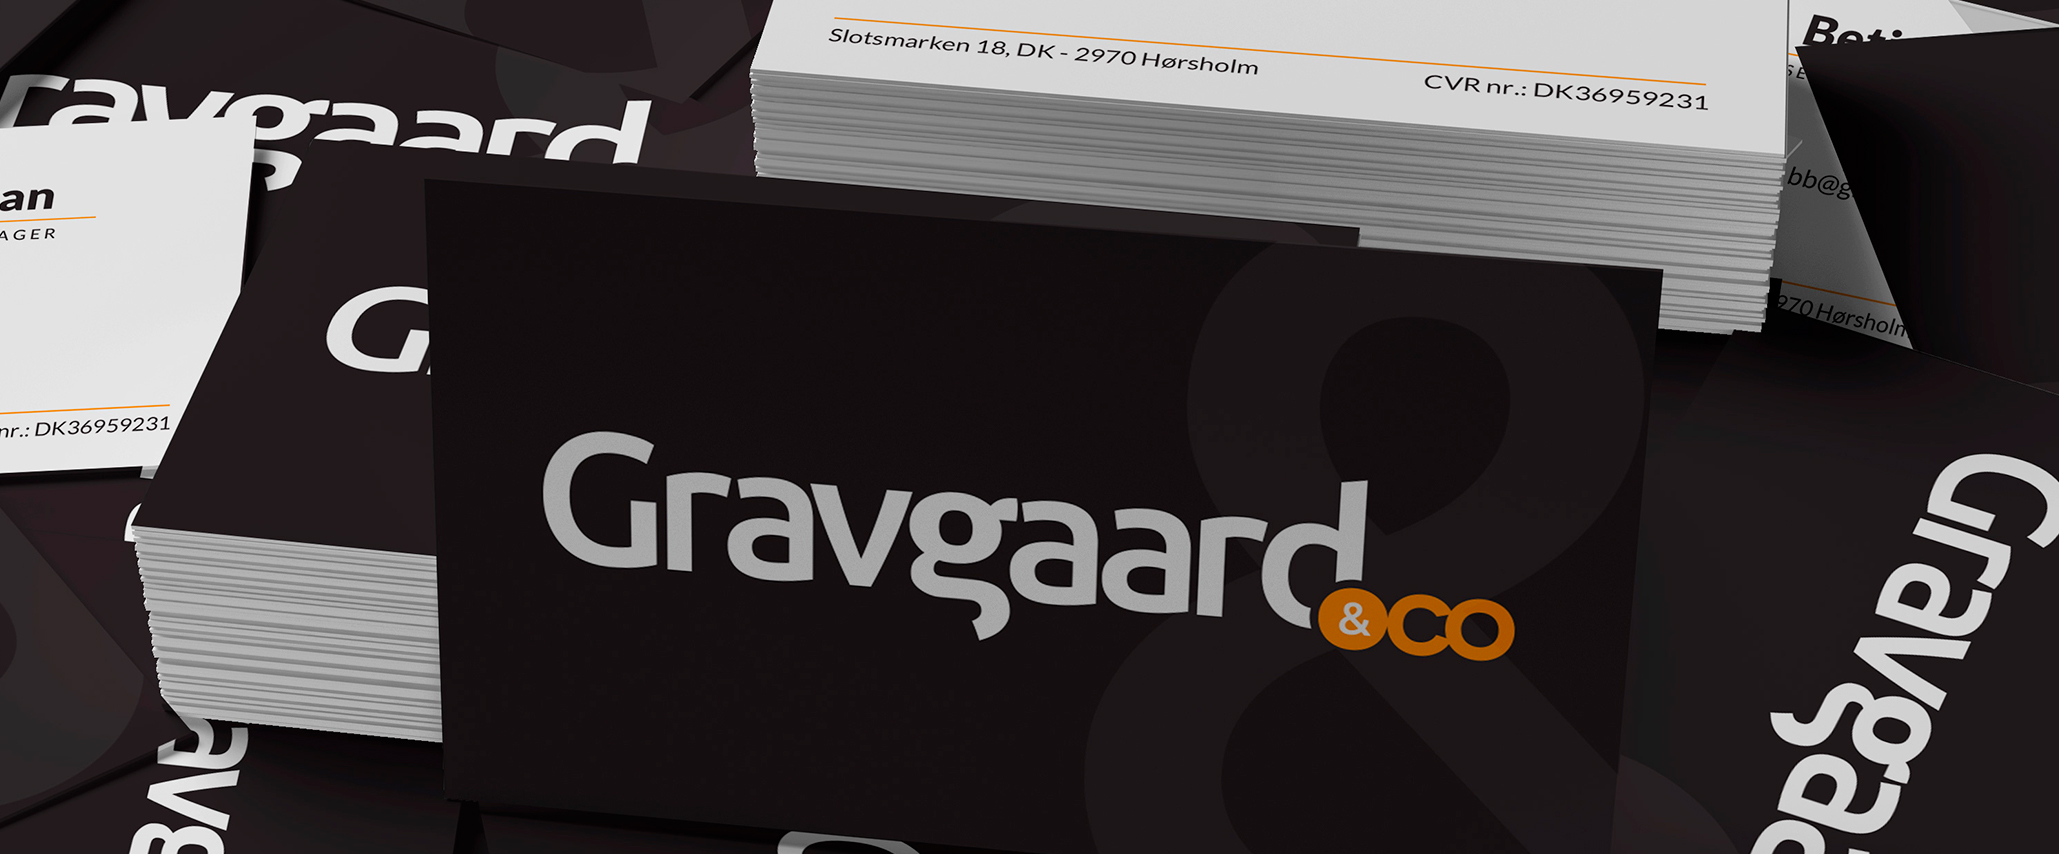 Gravgaard & co Logodesign - Design: Tegnestuen Undertryk